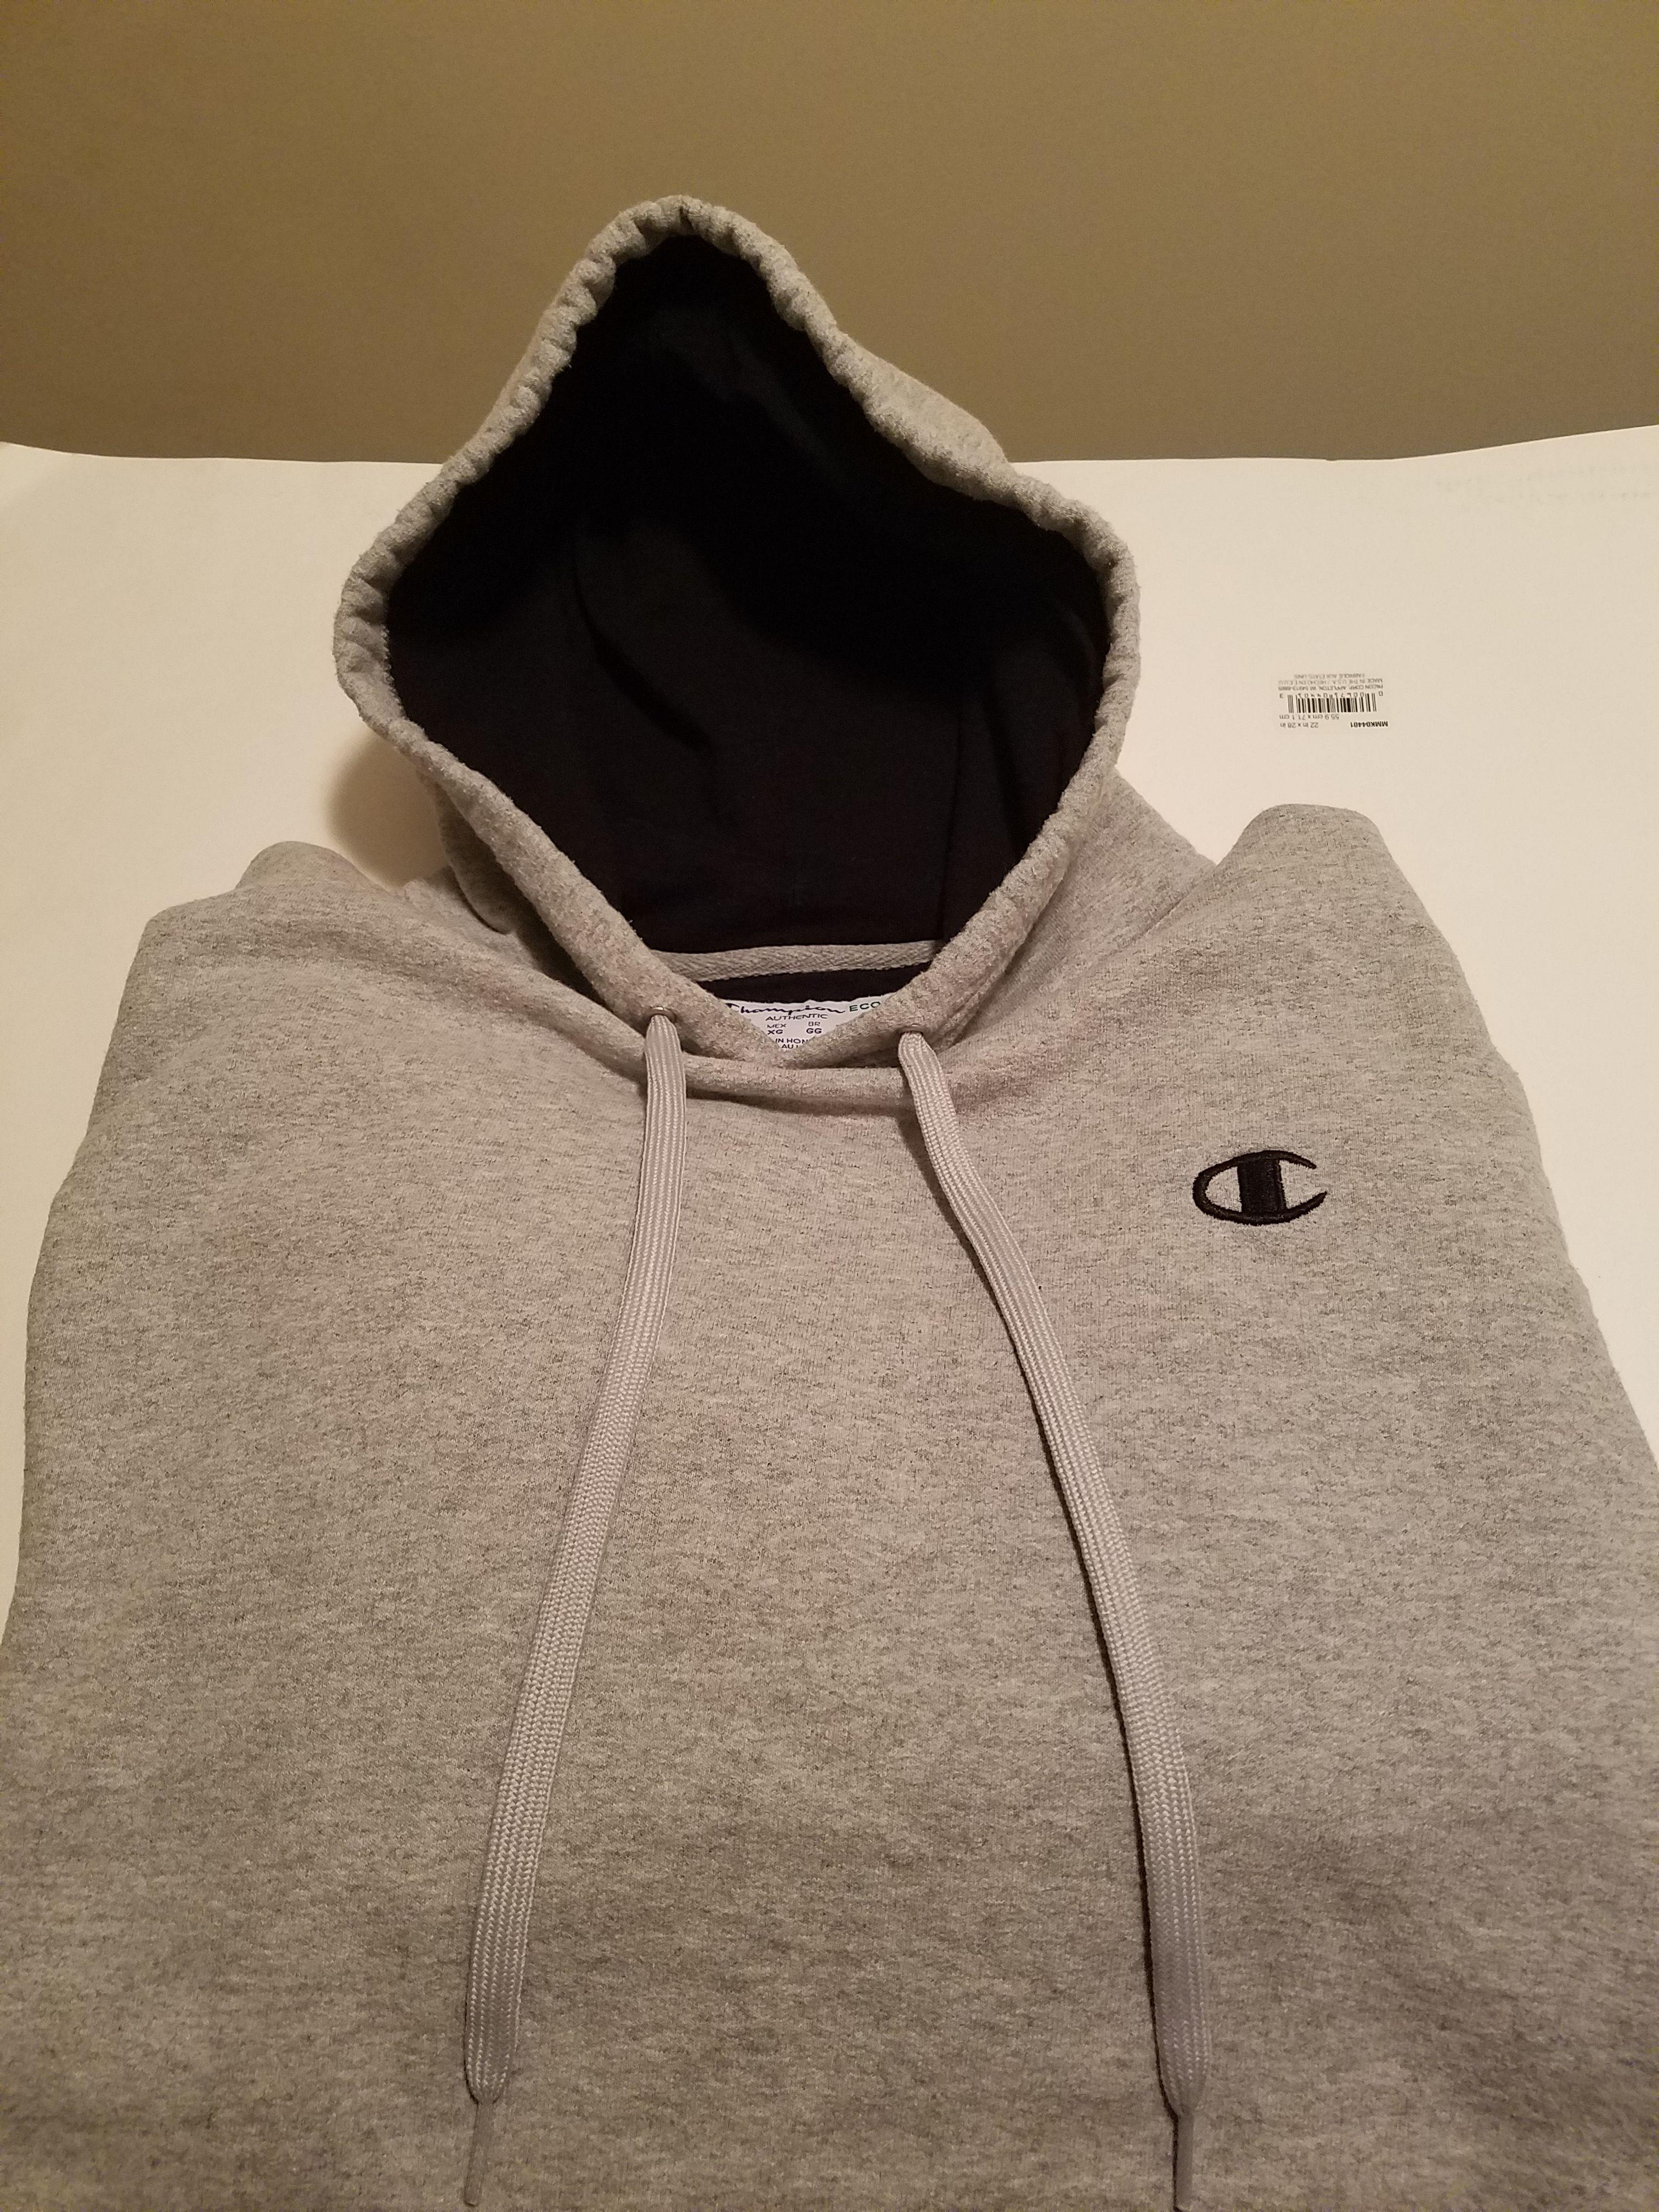 XL champion hoodie grey